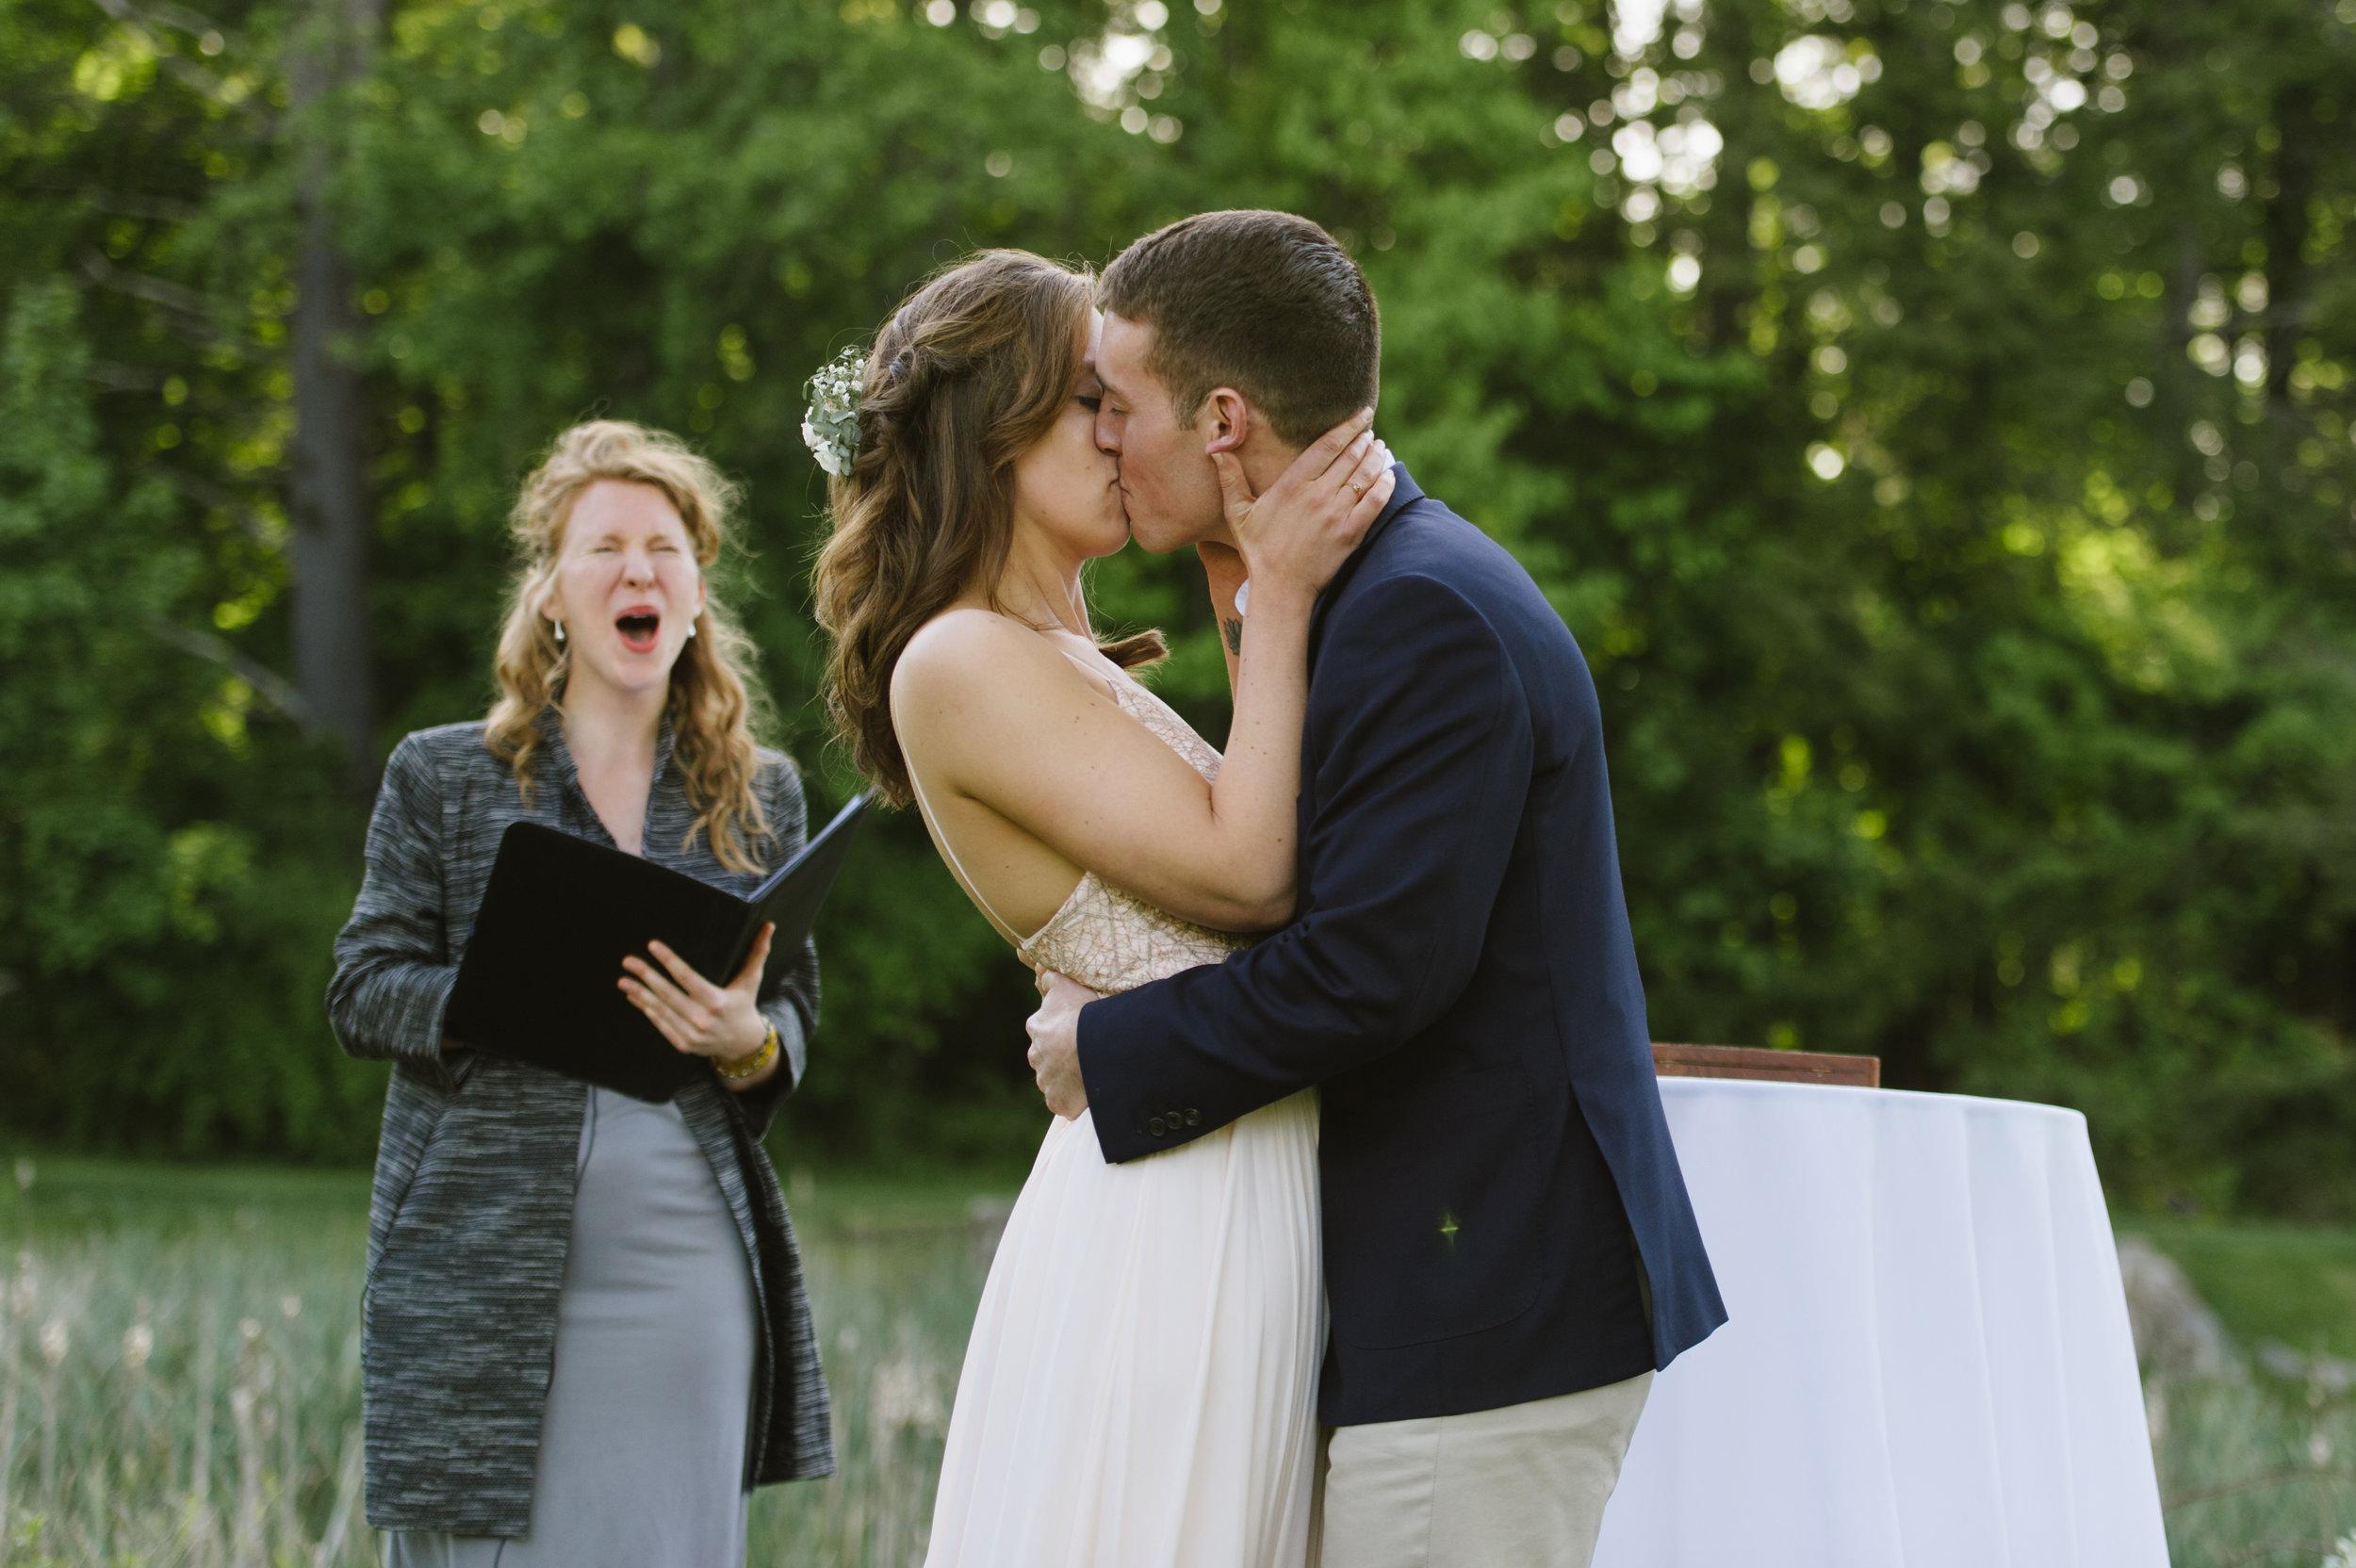 Creative-Wedding-Photography003.jpg